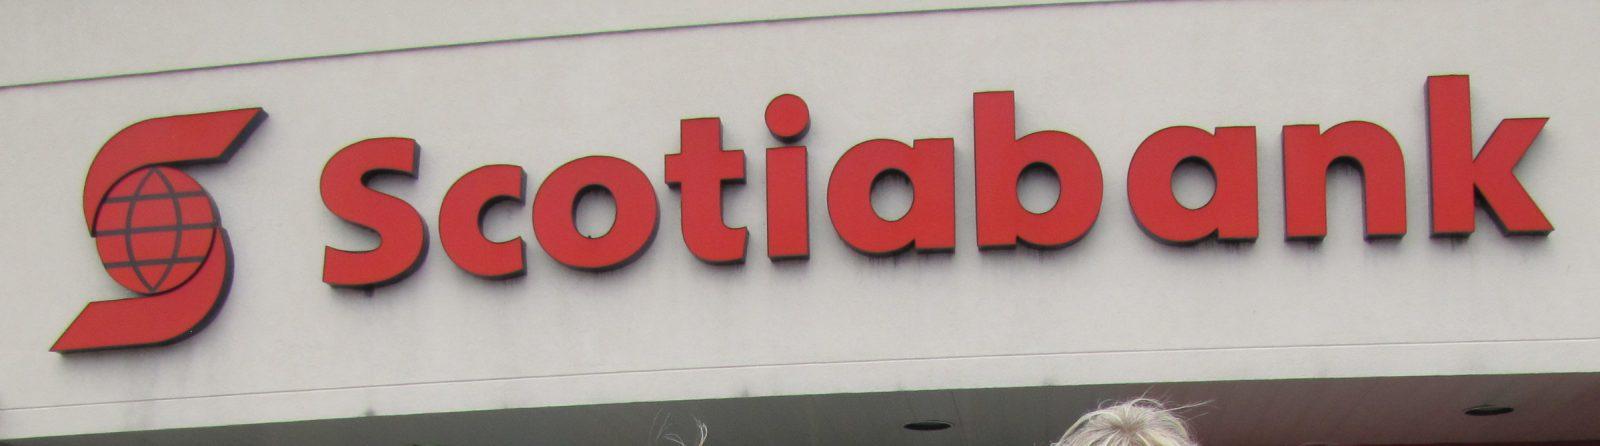 Scotiabank closing Cornwall Contact Centre